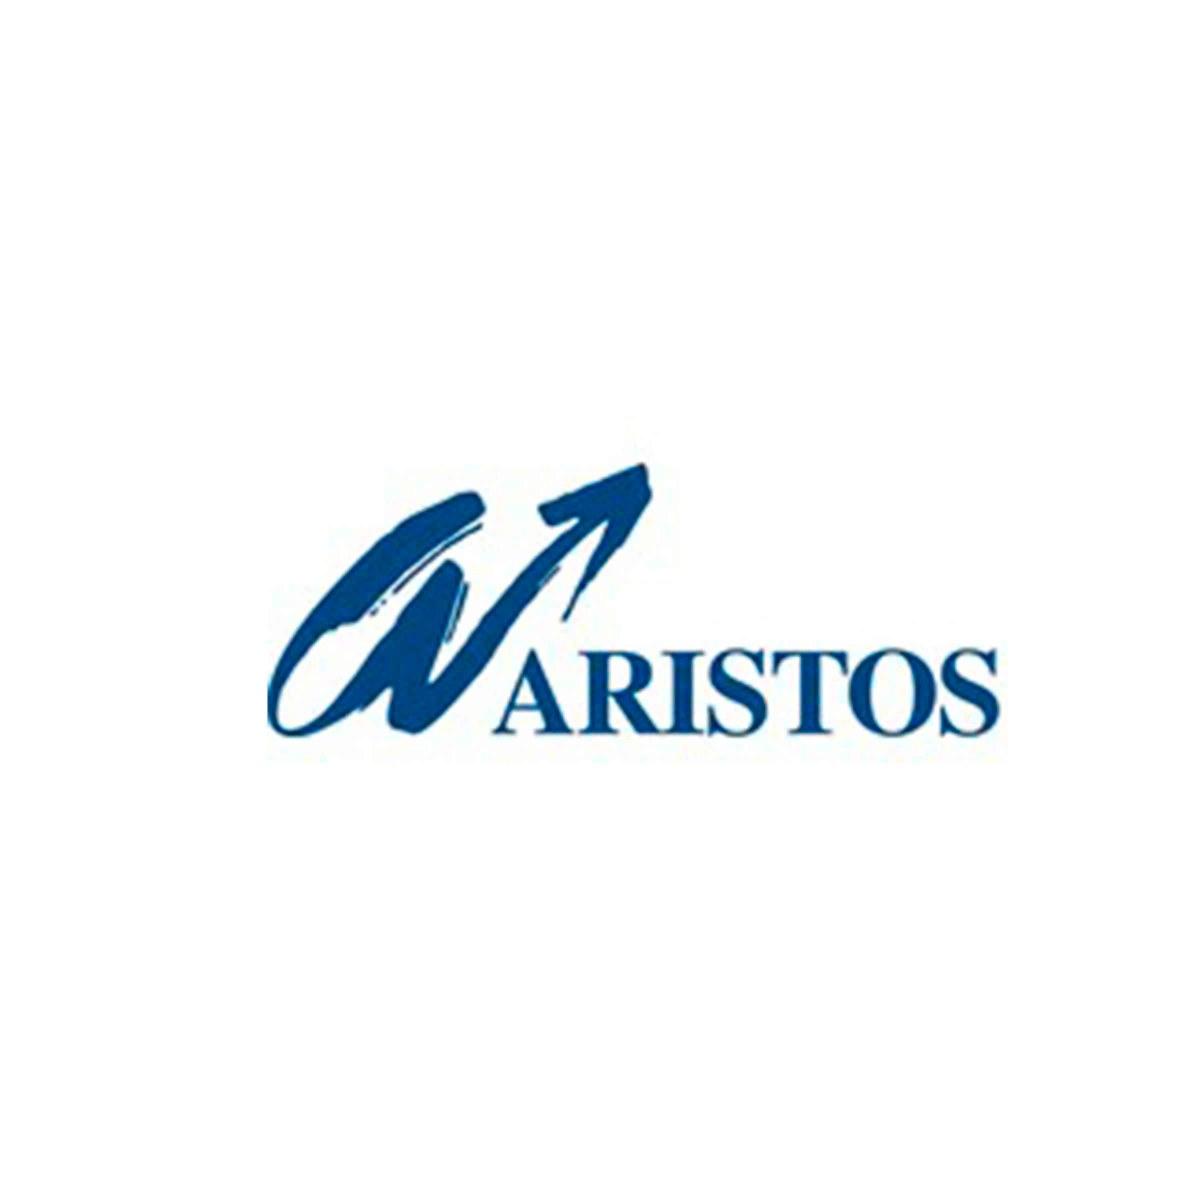 Aristos-1